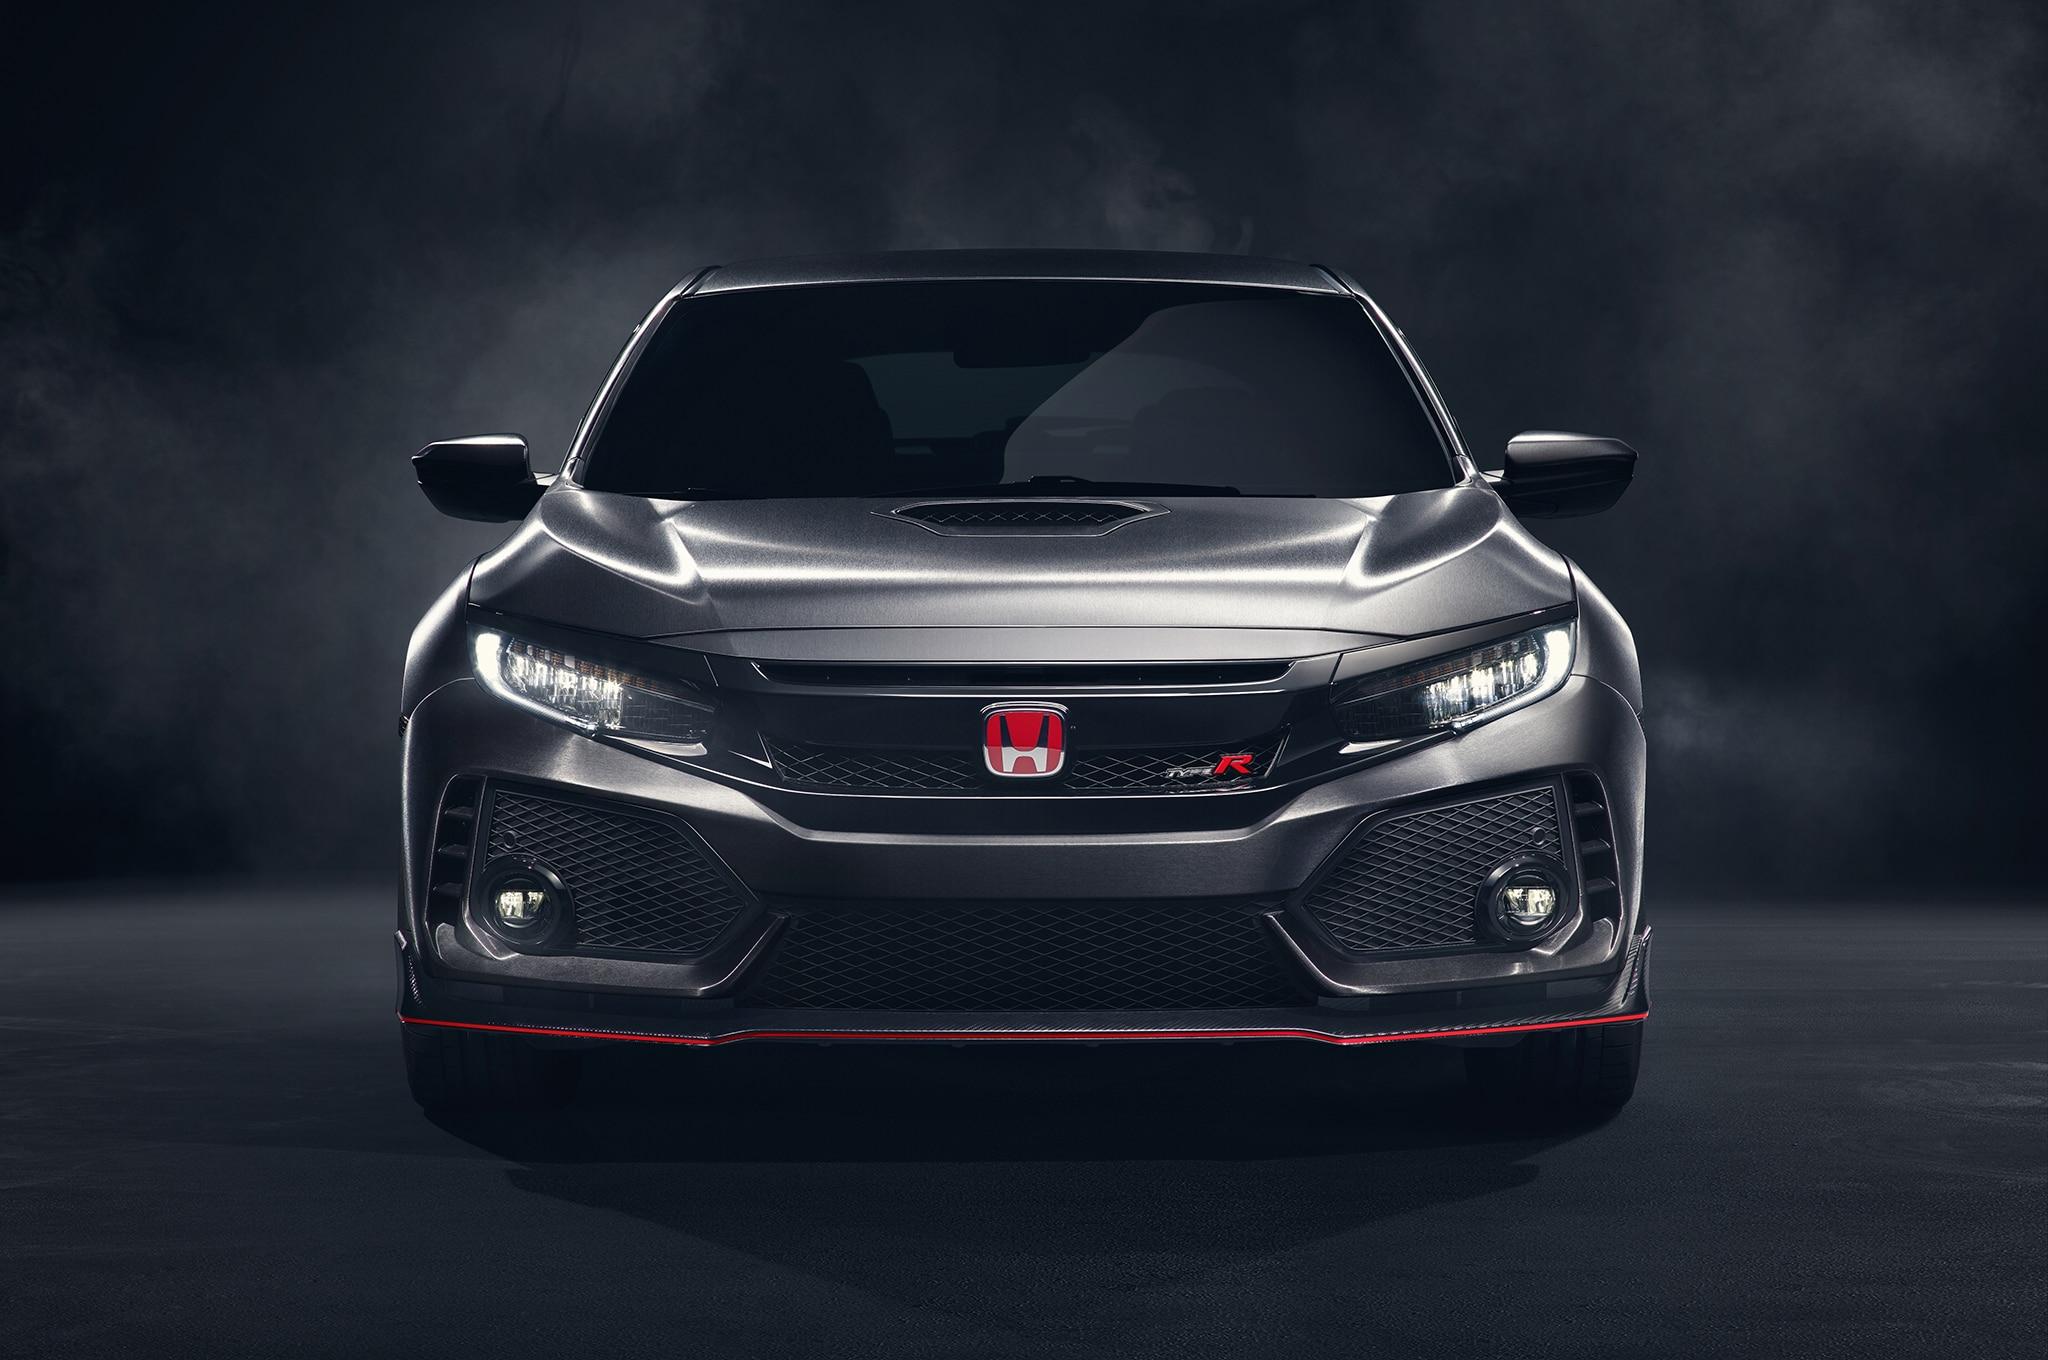 honda civic 2018 black. Brilliant Honda Show More Intended Honda Civic 2018 Black O